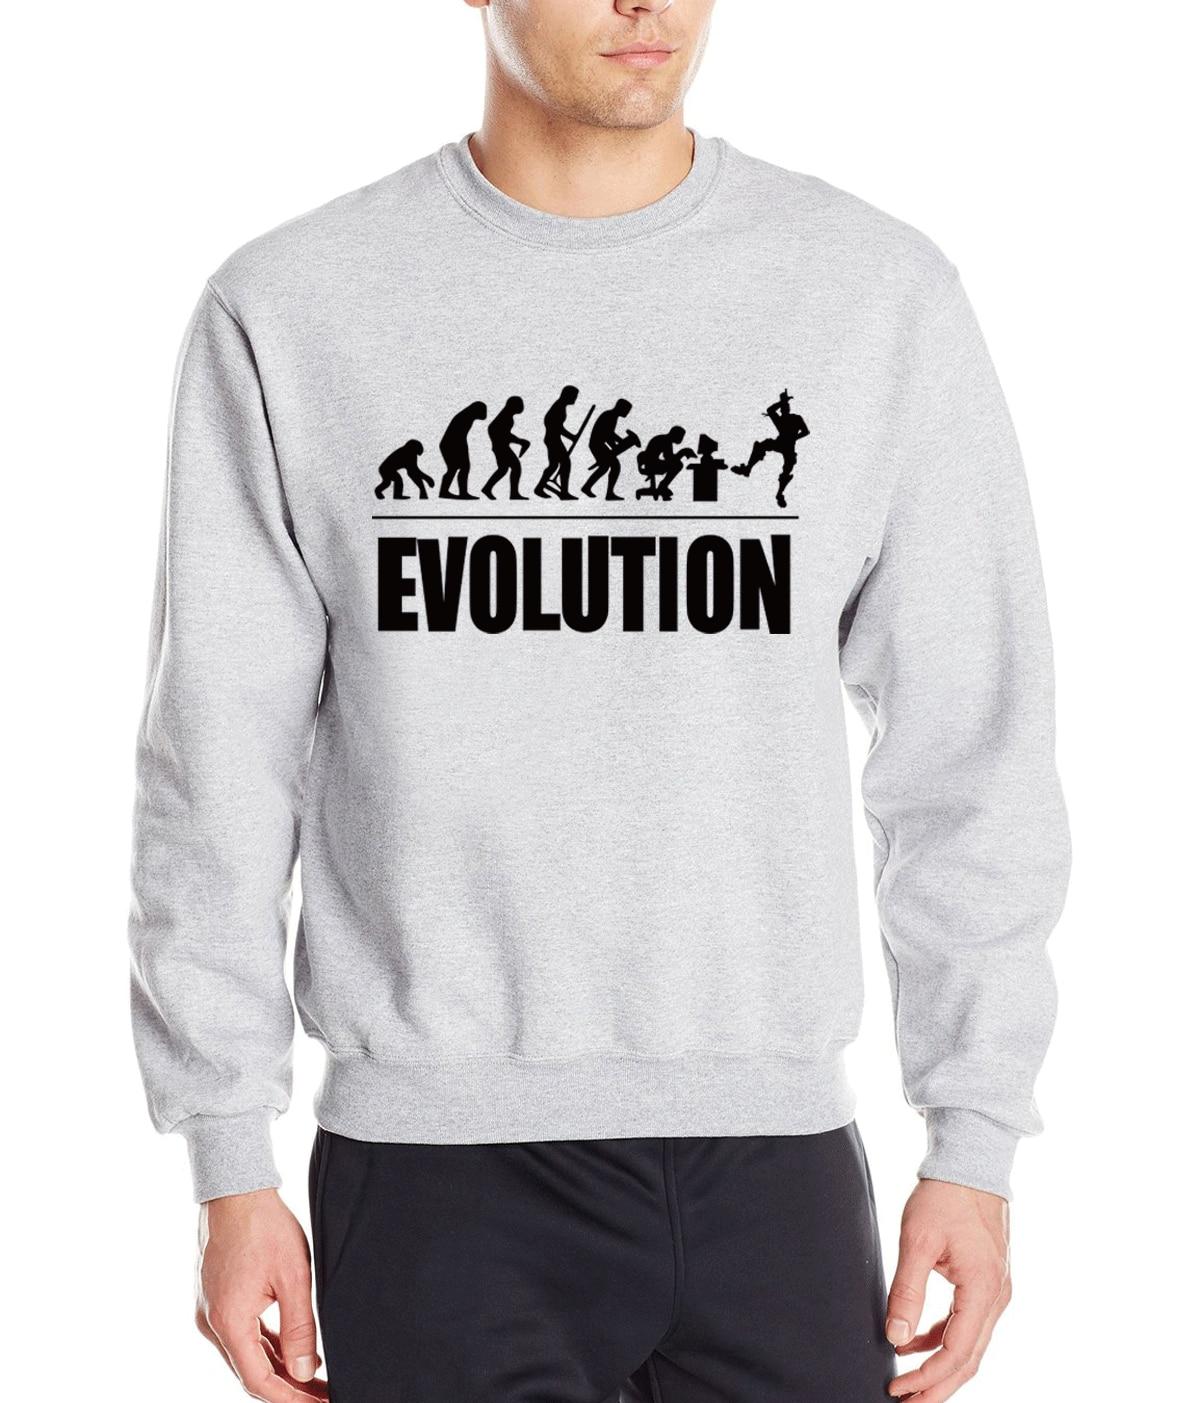 Evolution Funny Men Sweatshirt New 2019 Autumn Winter Punk Harajuku Style  Hoodies Hipster Men's Pullovers Long Sleeve Tracksuit